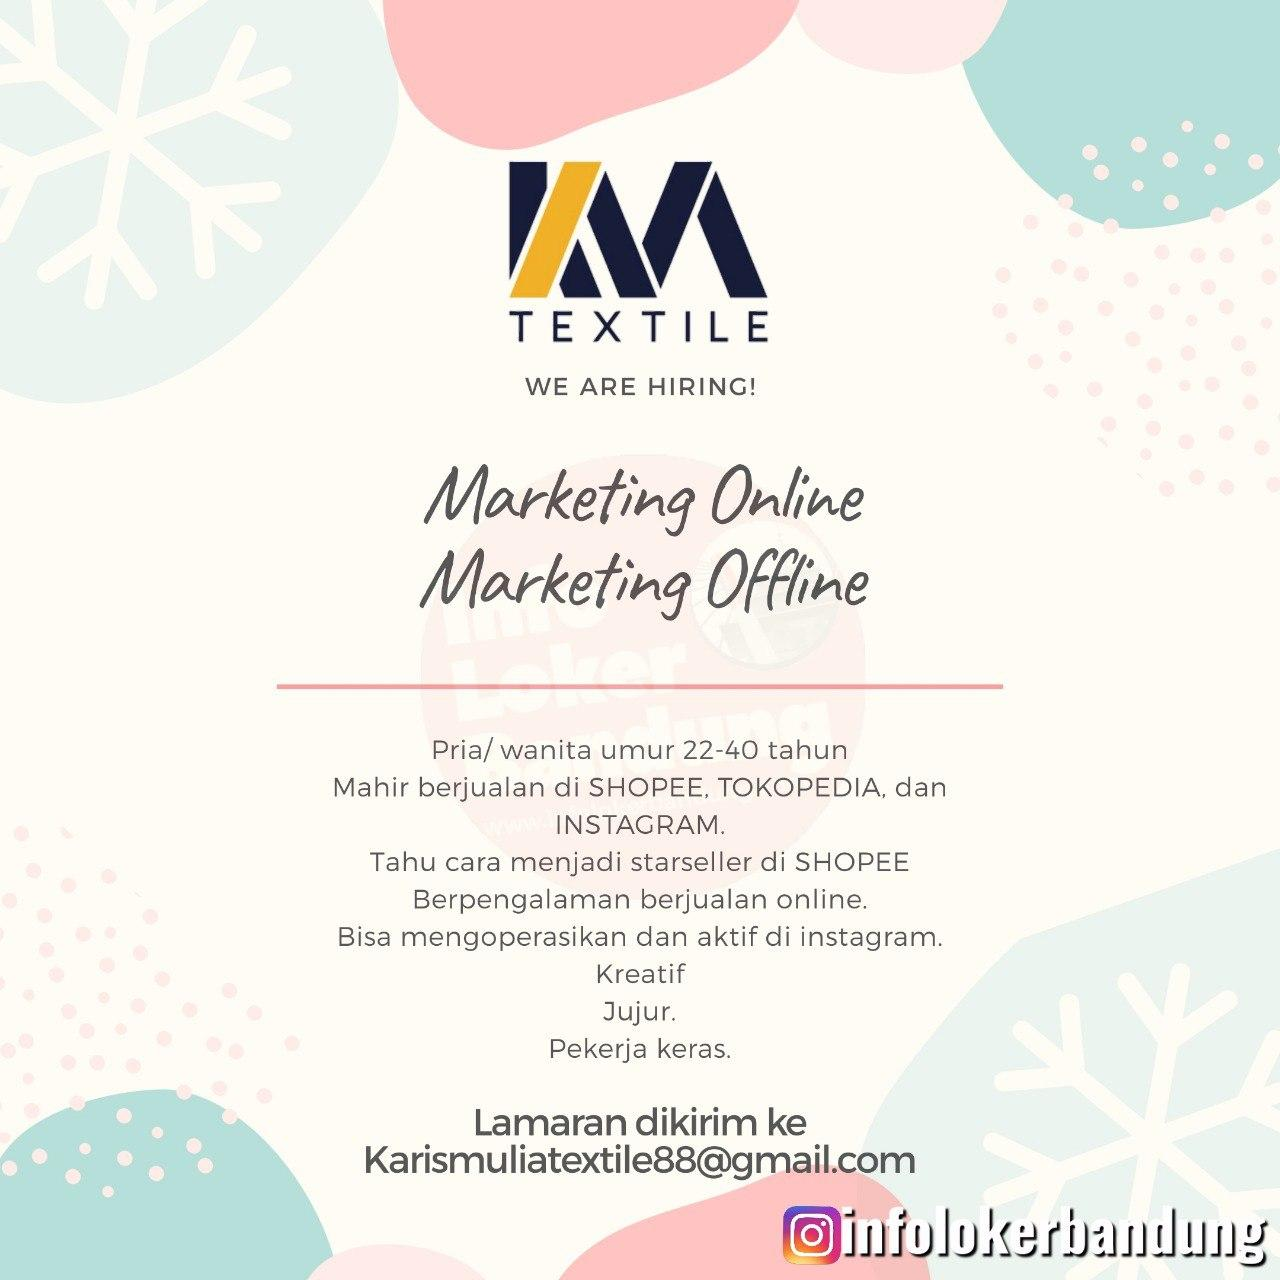 Lowongan Kreja Marketing Online & Marketing Offline Karis Mulia Textile Bandung April 2020